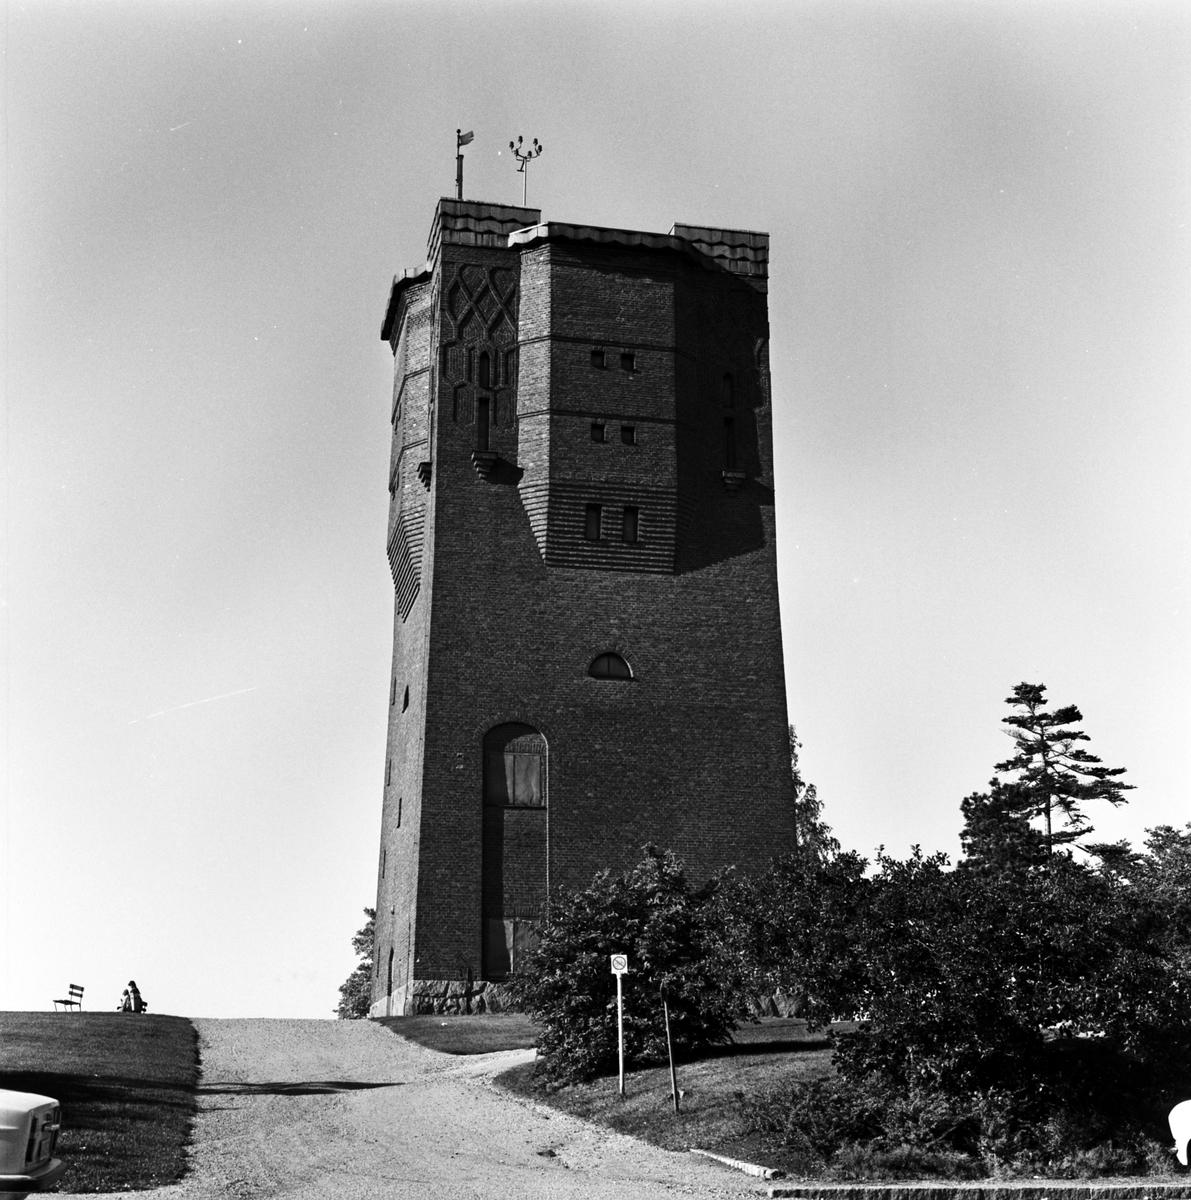 Vattentornet i Tornparken, Sundbyberg